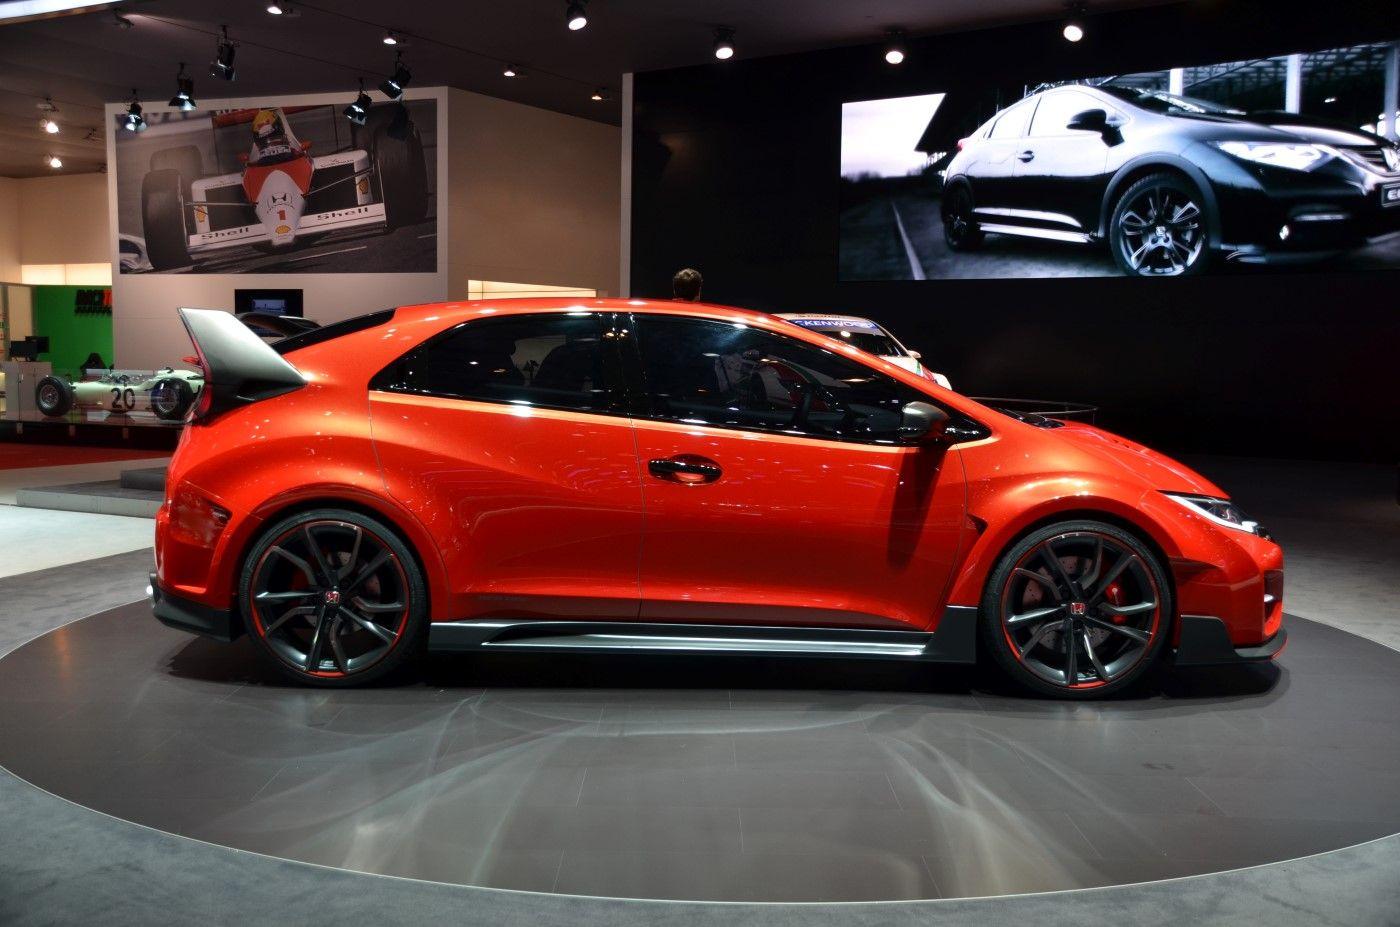 2015 Honda Civic Type R Concept Revealed In Geneva: Live Photos And ...